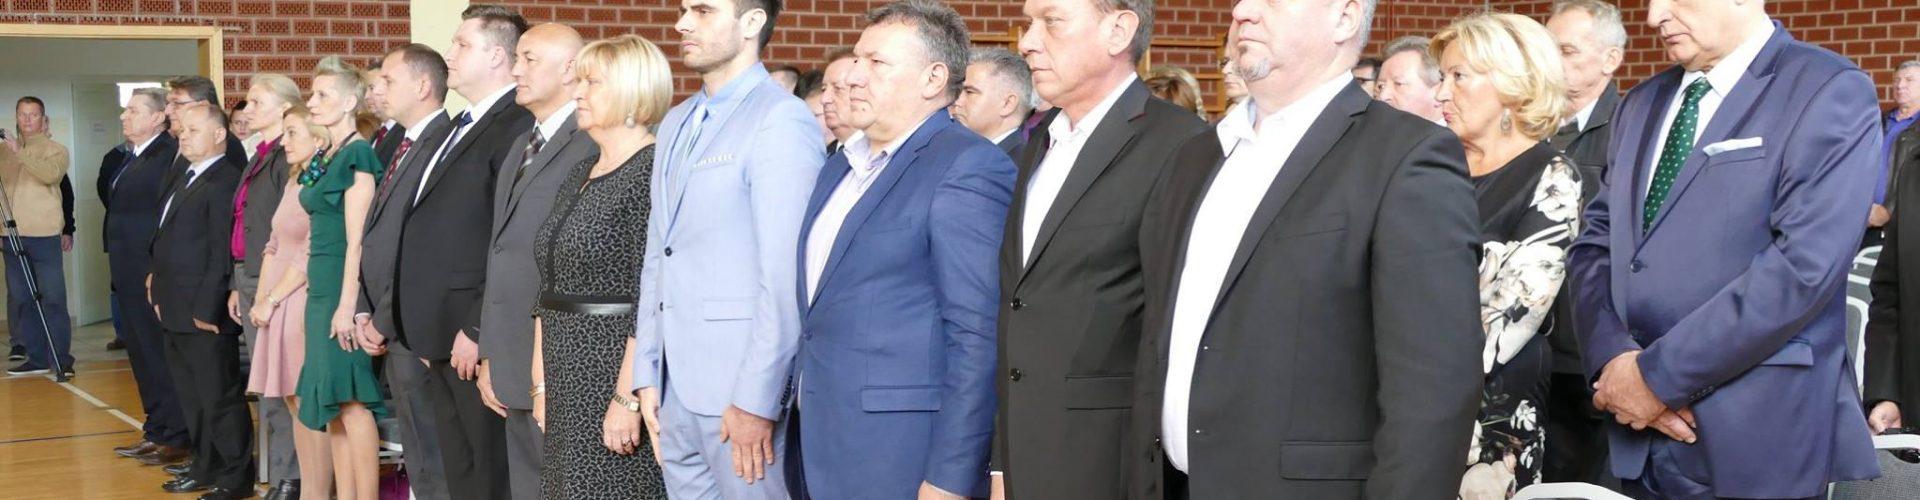 Gradonačelnik na obilježavanju Dana Općine Martinska Ves